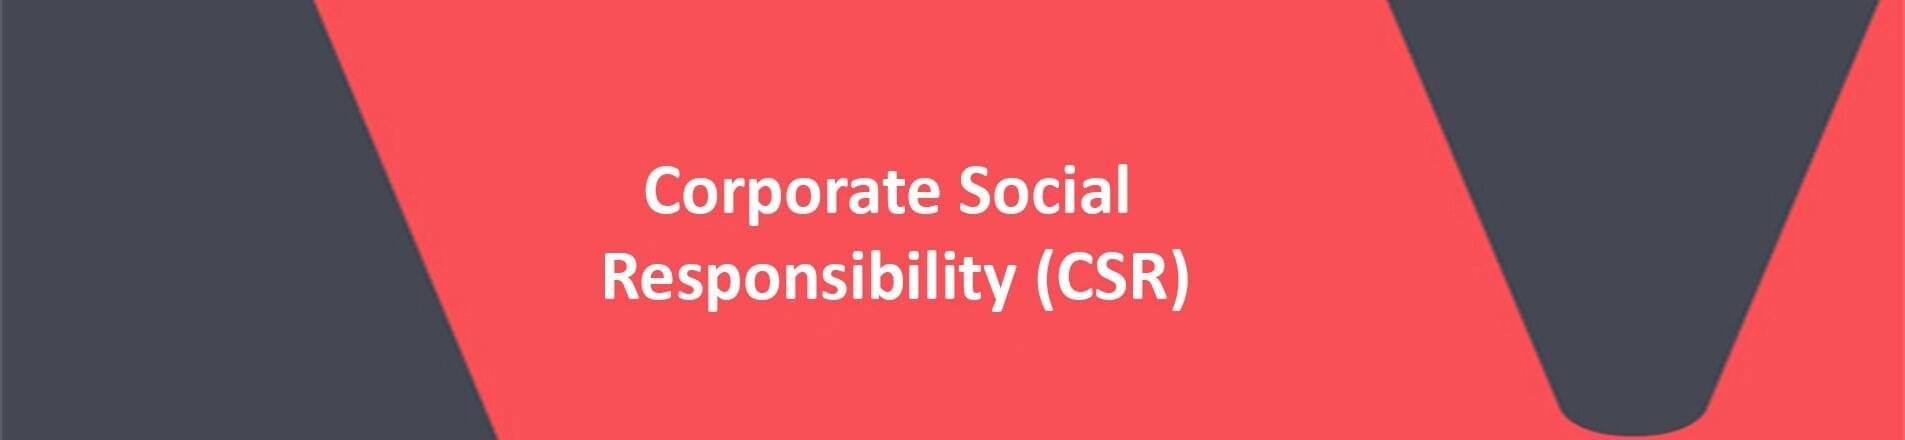 Corporate Social Responsibility (CSR).